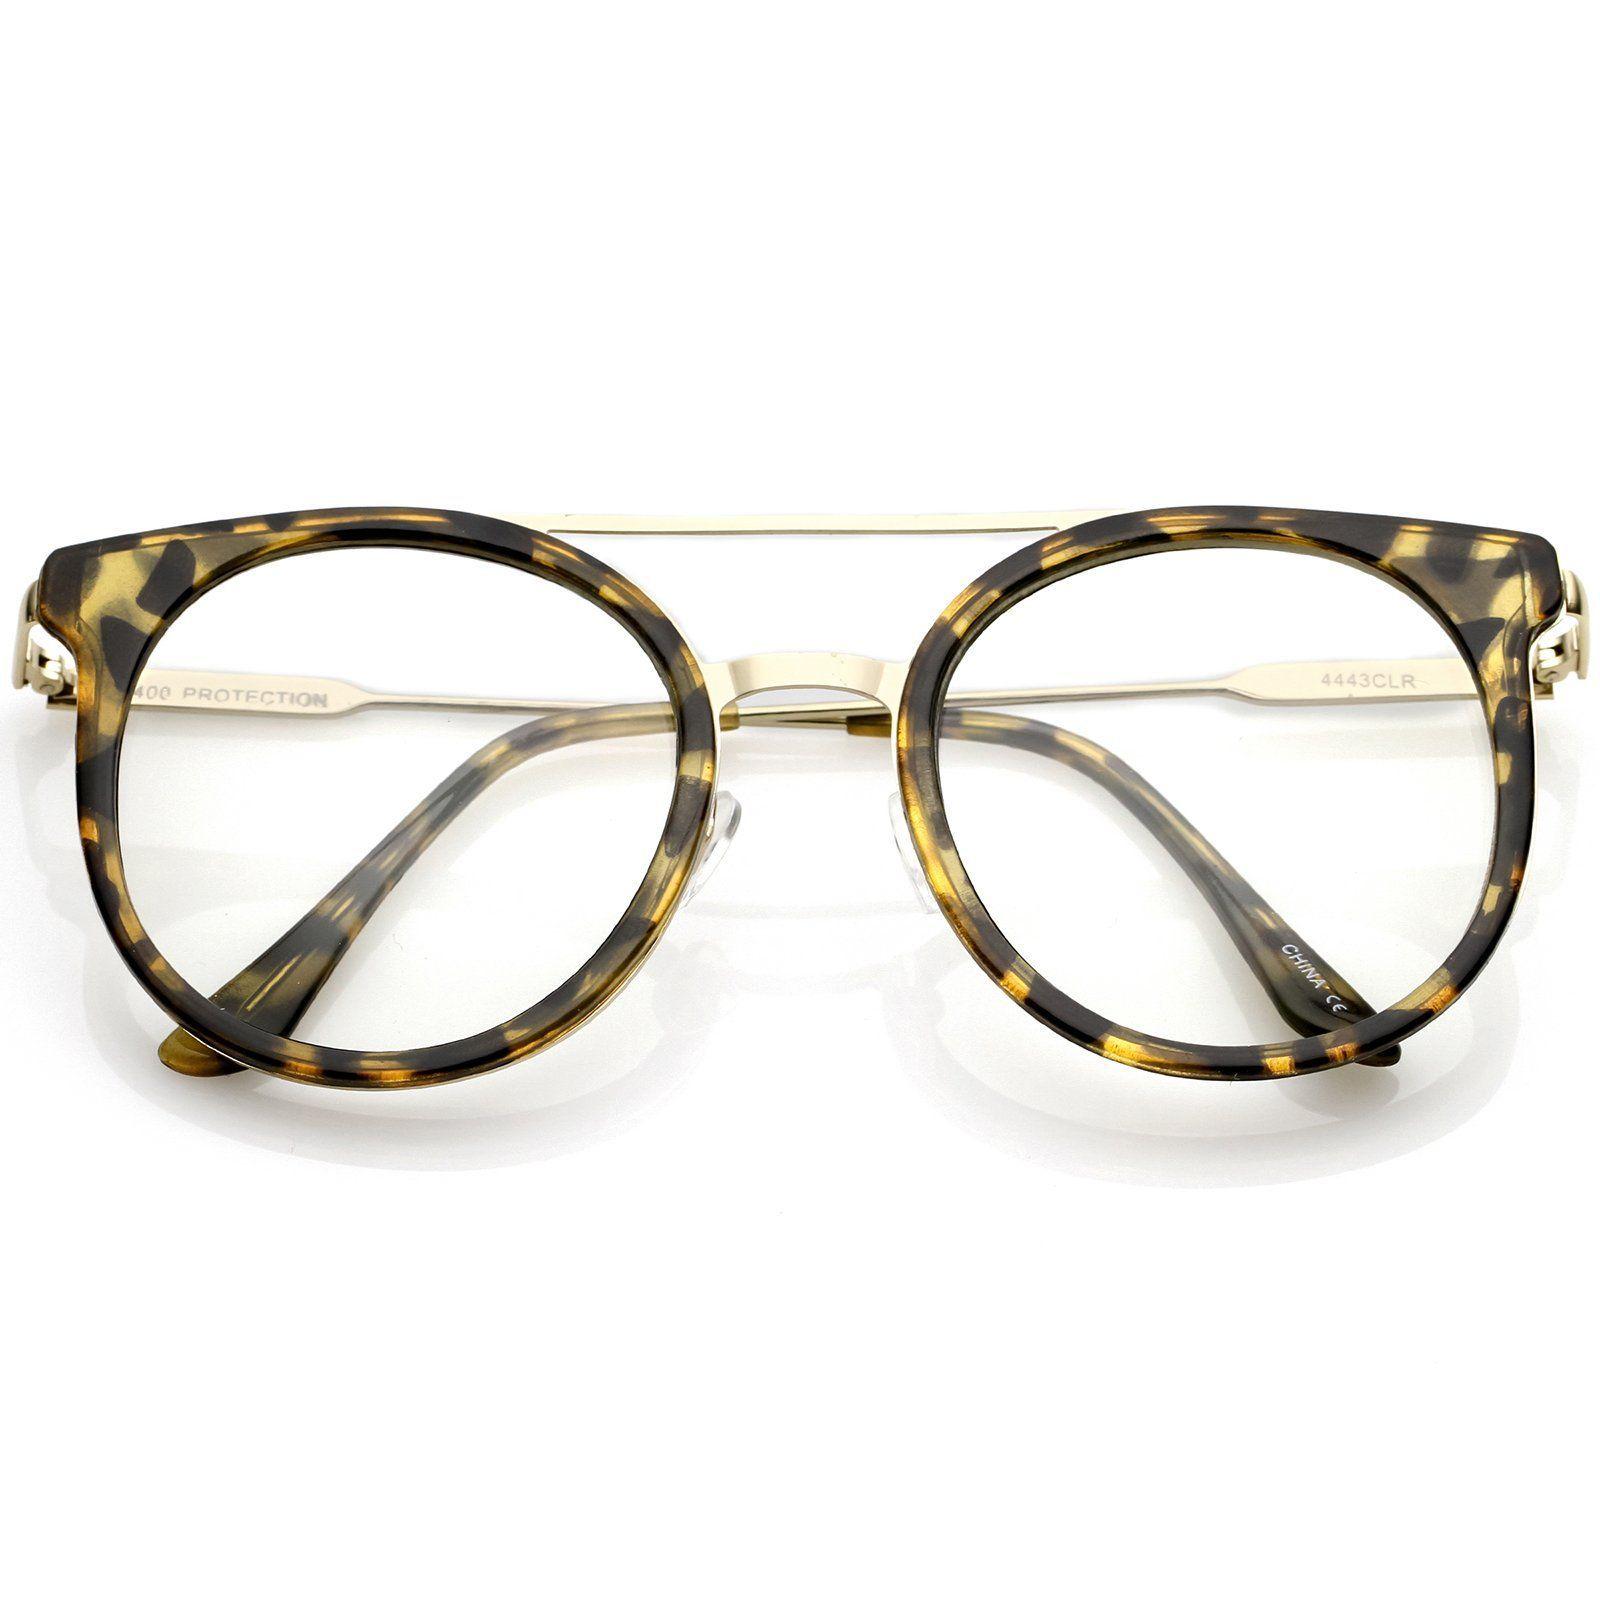 000f55e0b24 Horn Rimmed Double Nose Bridge Clear Lens P3 Round Eyeglasses 50mm ...